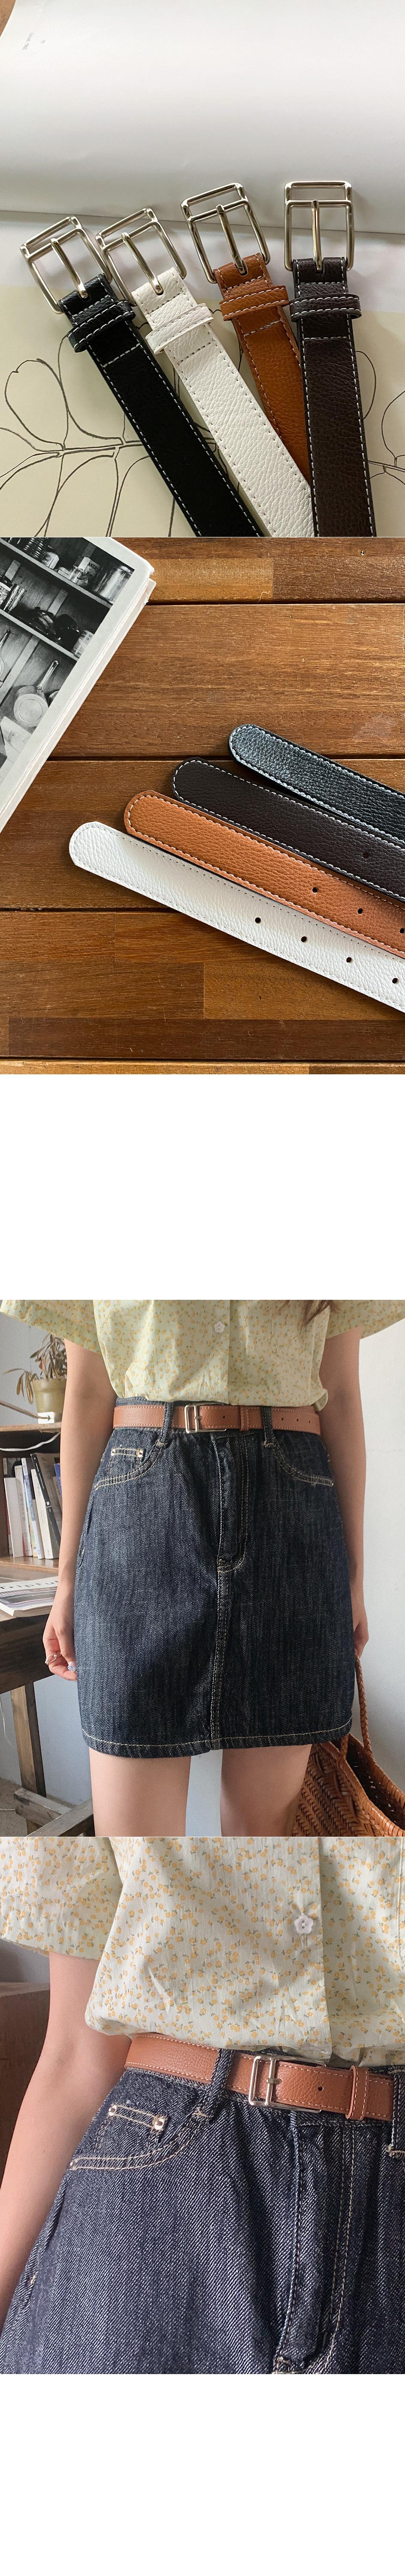 Yuko stitch leather belt